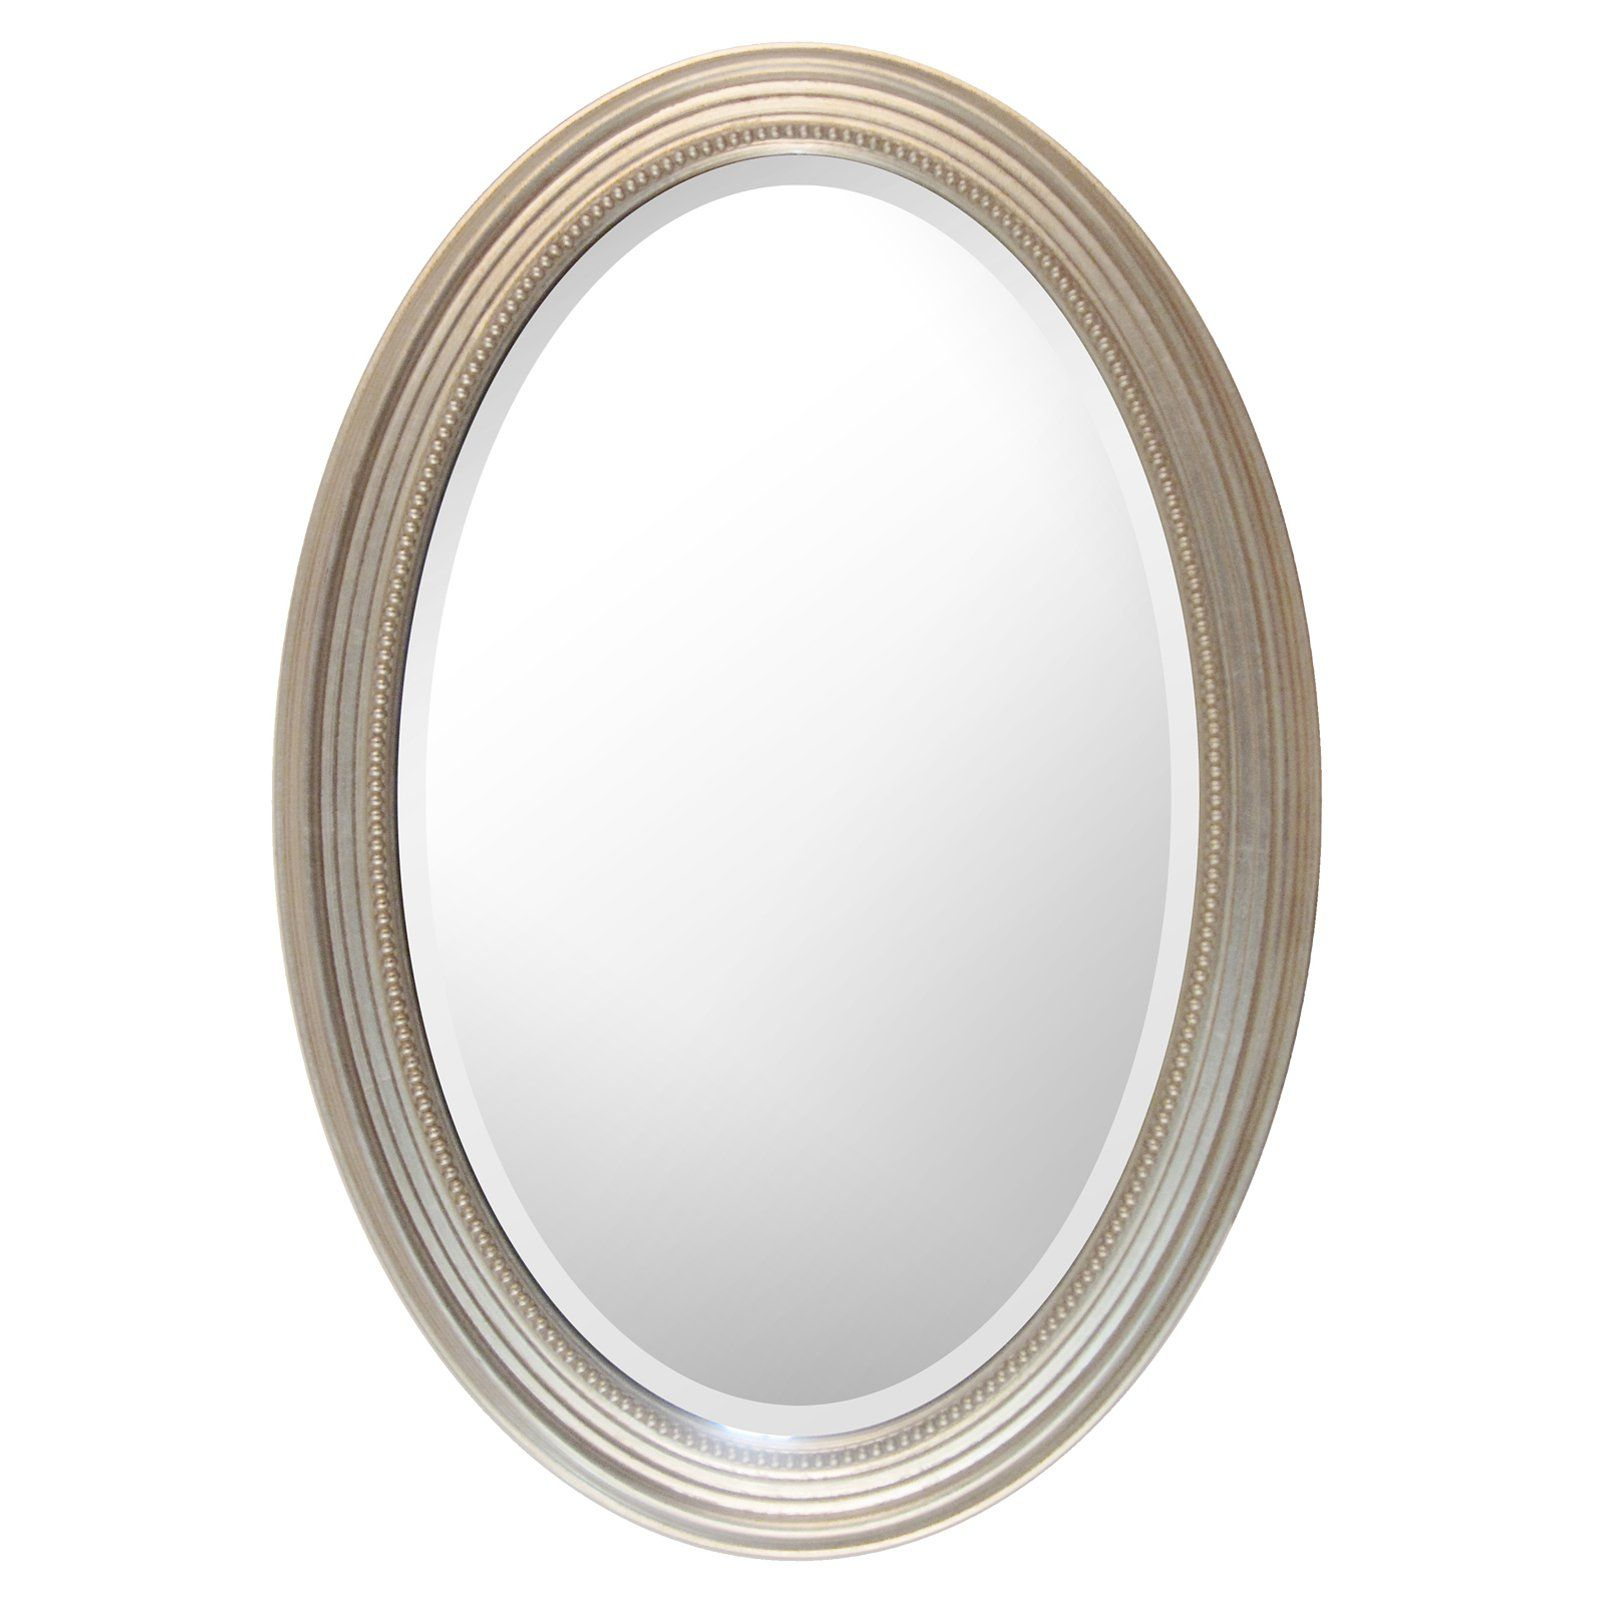 Mirrorize Canada Oval Silver Wall Mirror 21W x 31H in